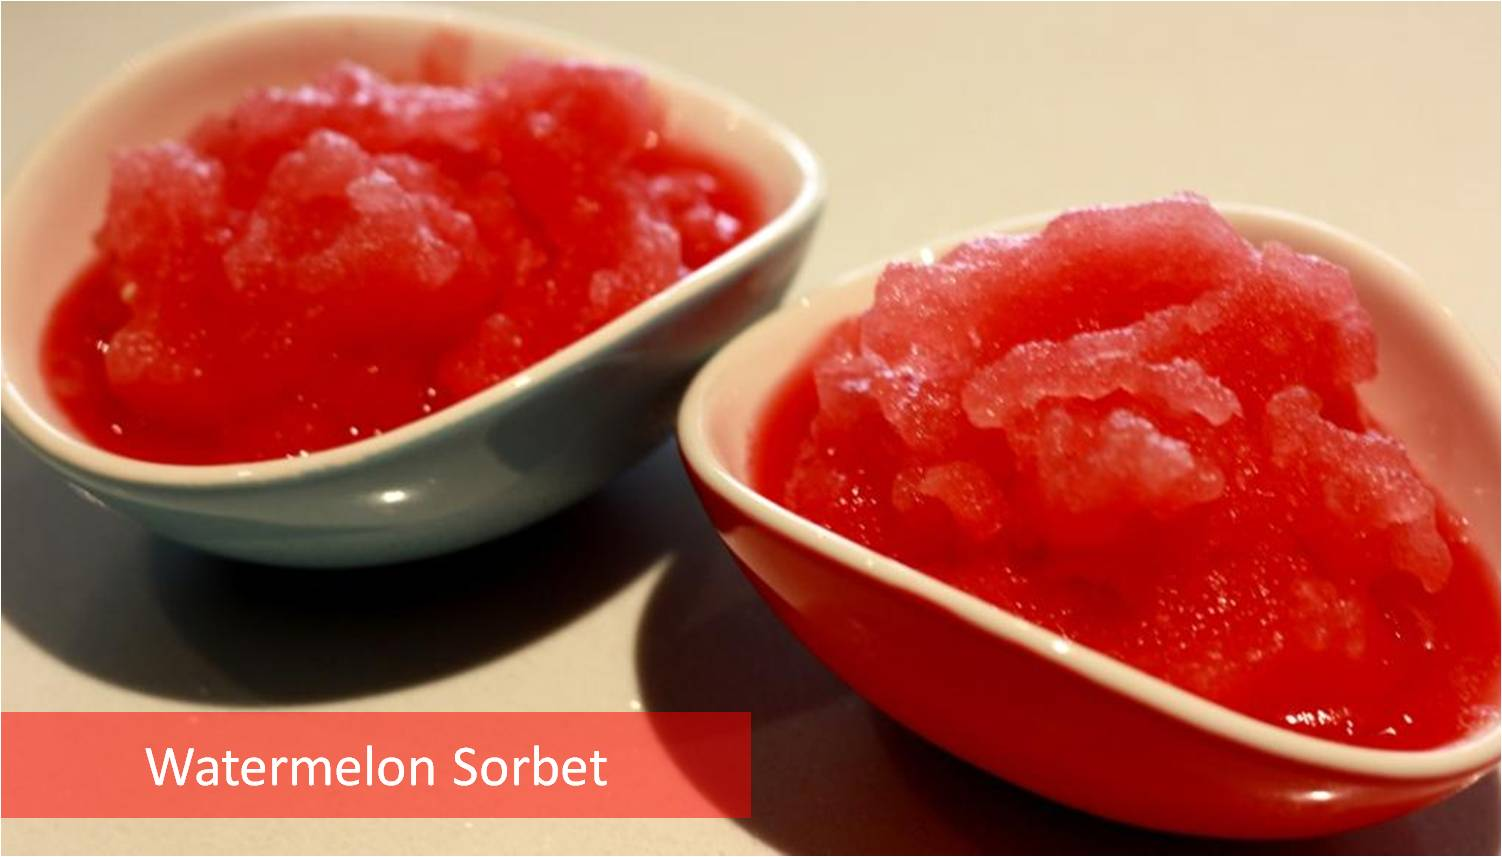 Watermelon Sorbet Recipe - My Weekend Kitchen